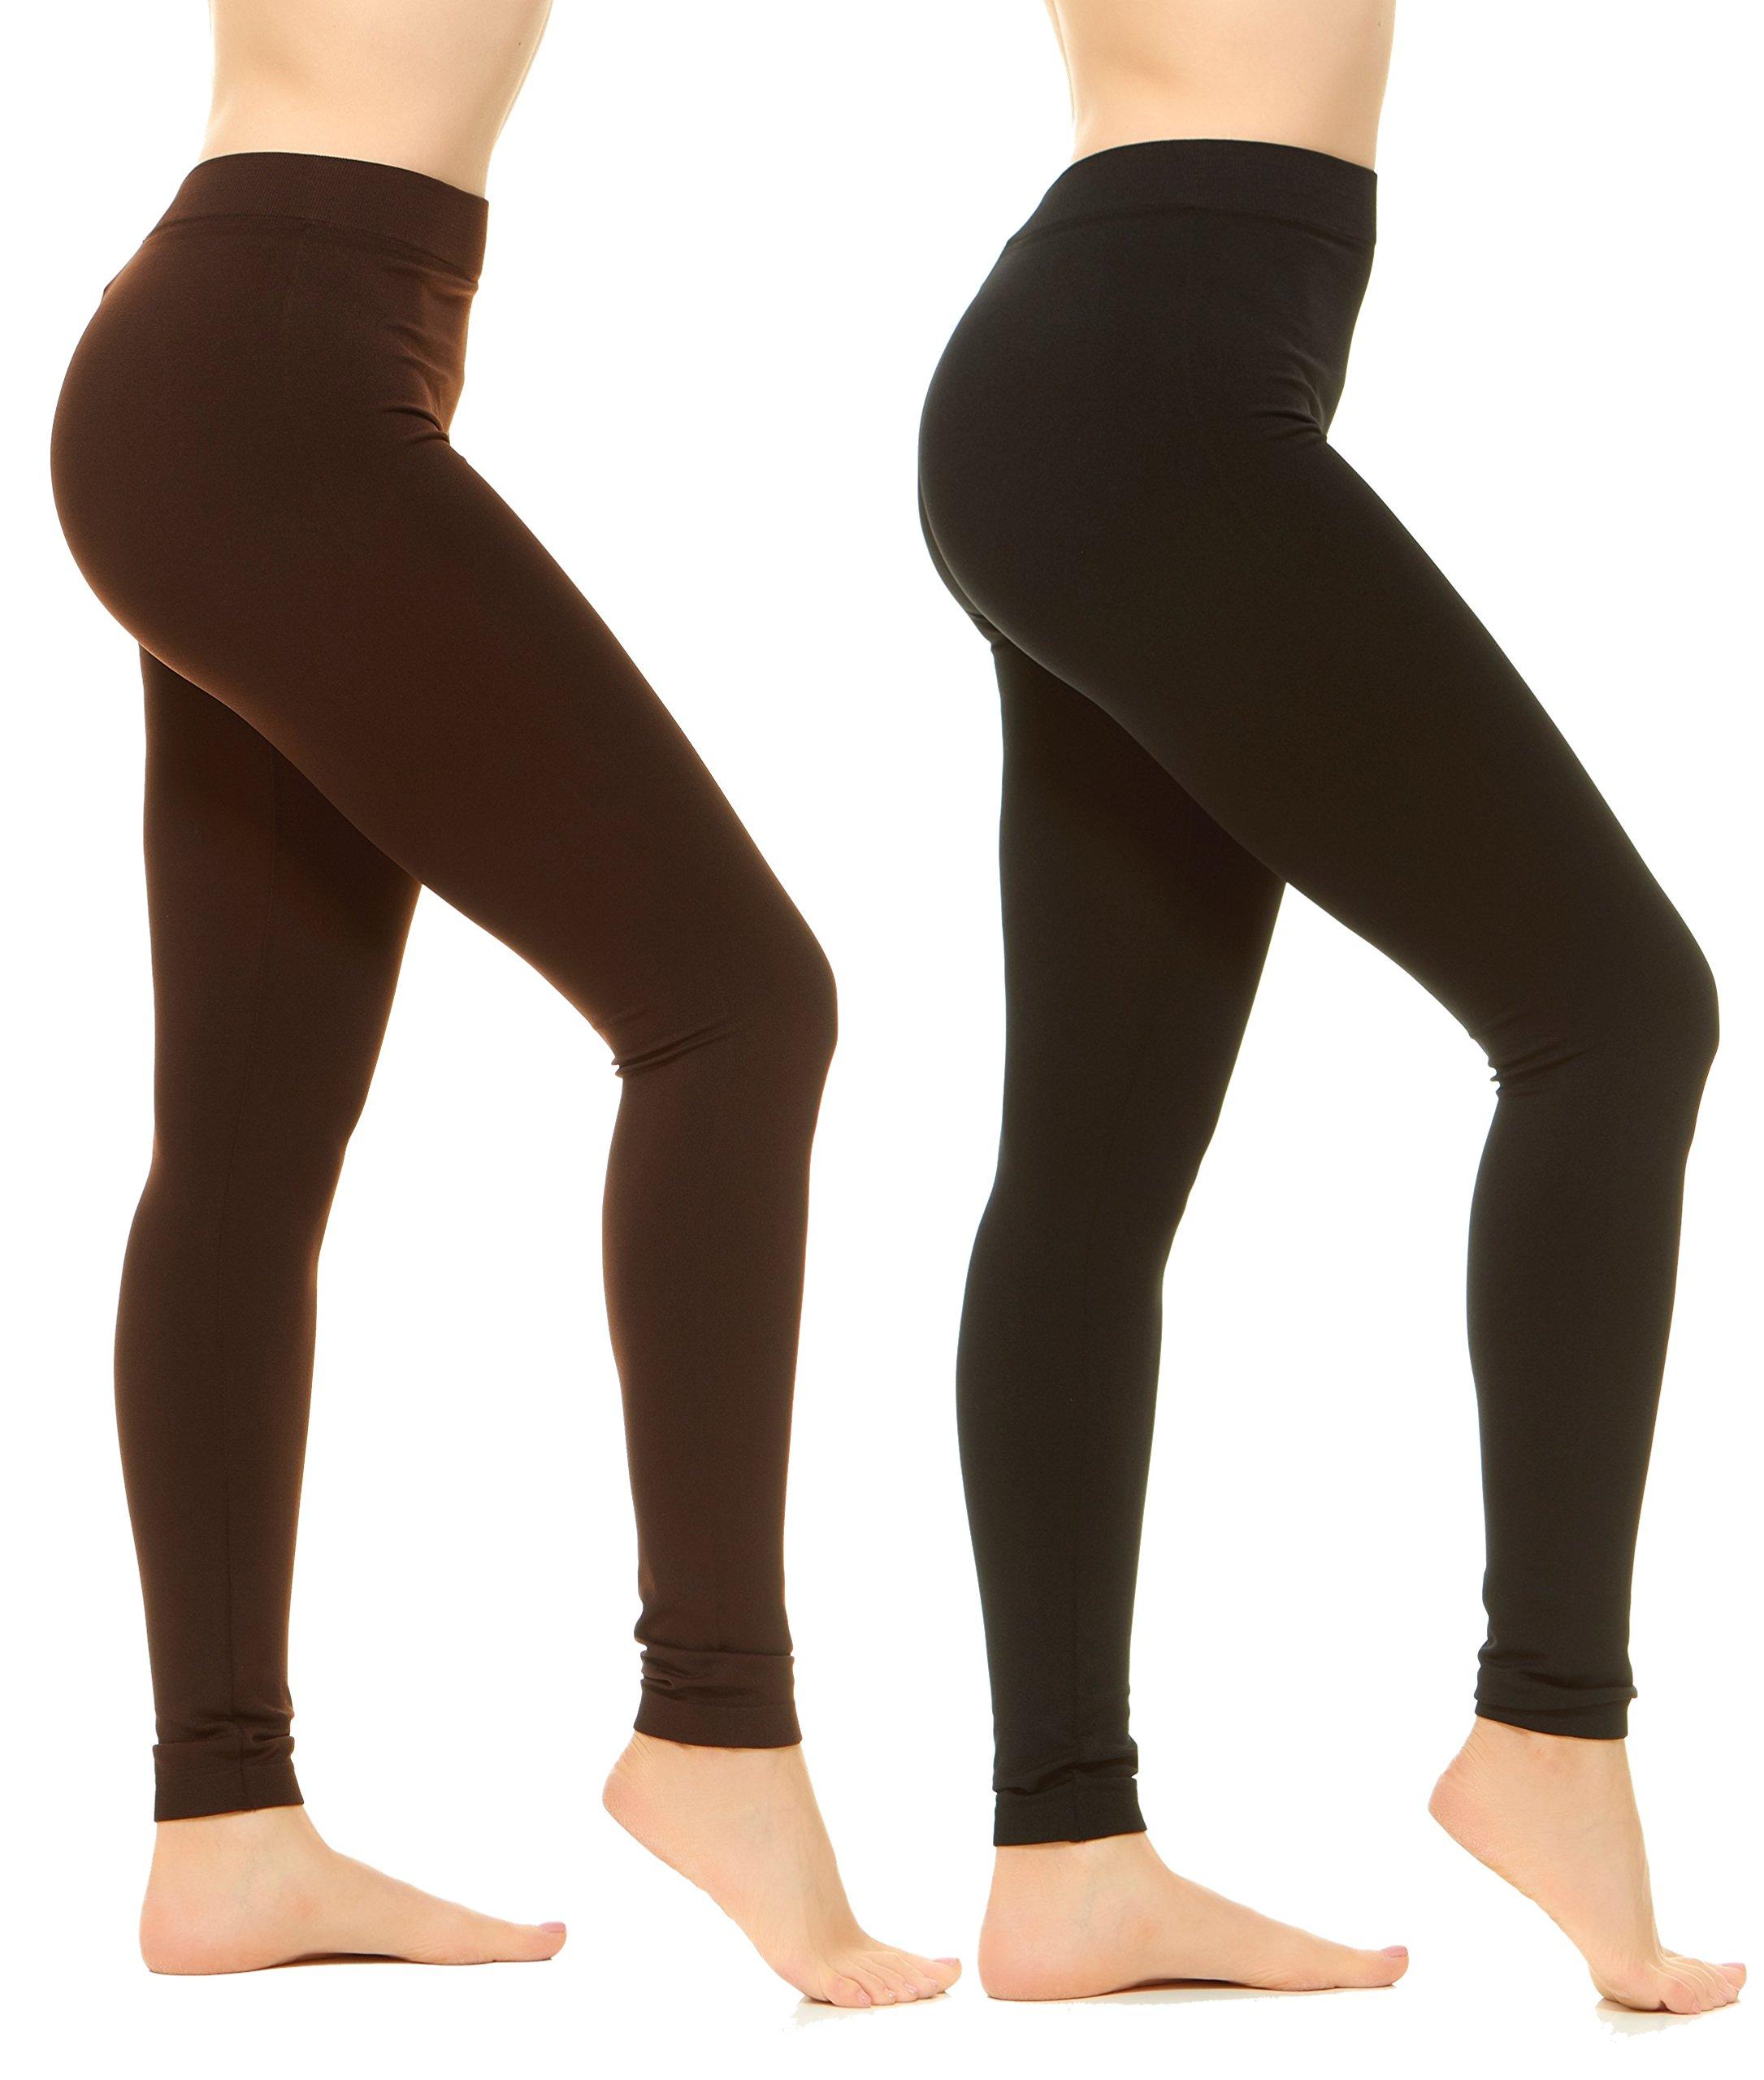 Unique Styles High Waist Leggings for Women Soft Yoga Pants Ribbed Waistband (Plus Size, 2-PK: Black, Brown)